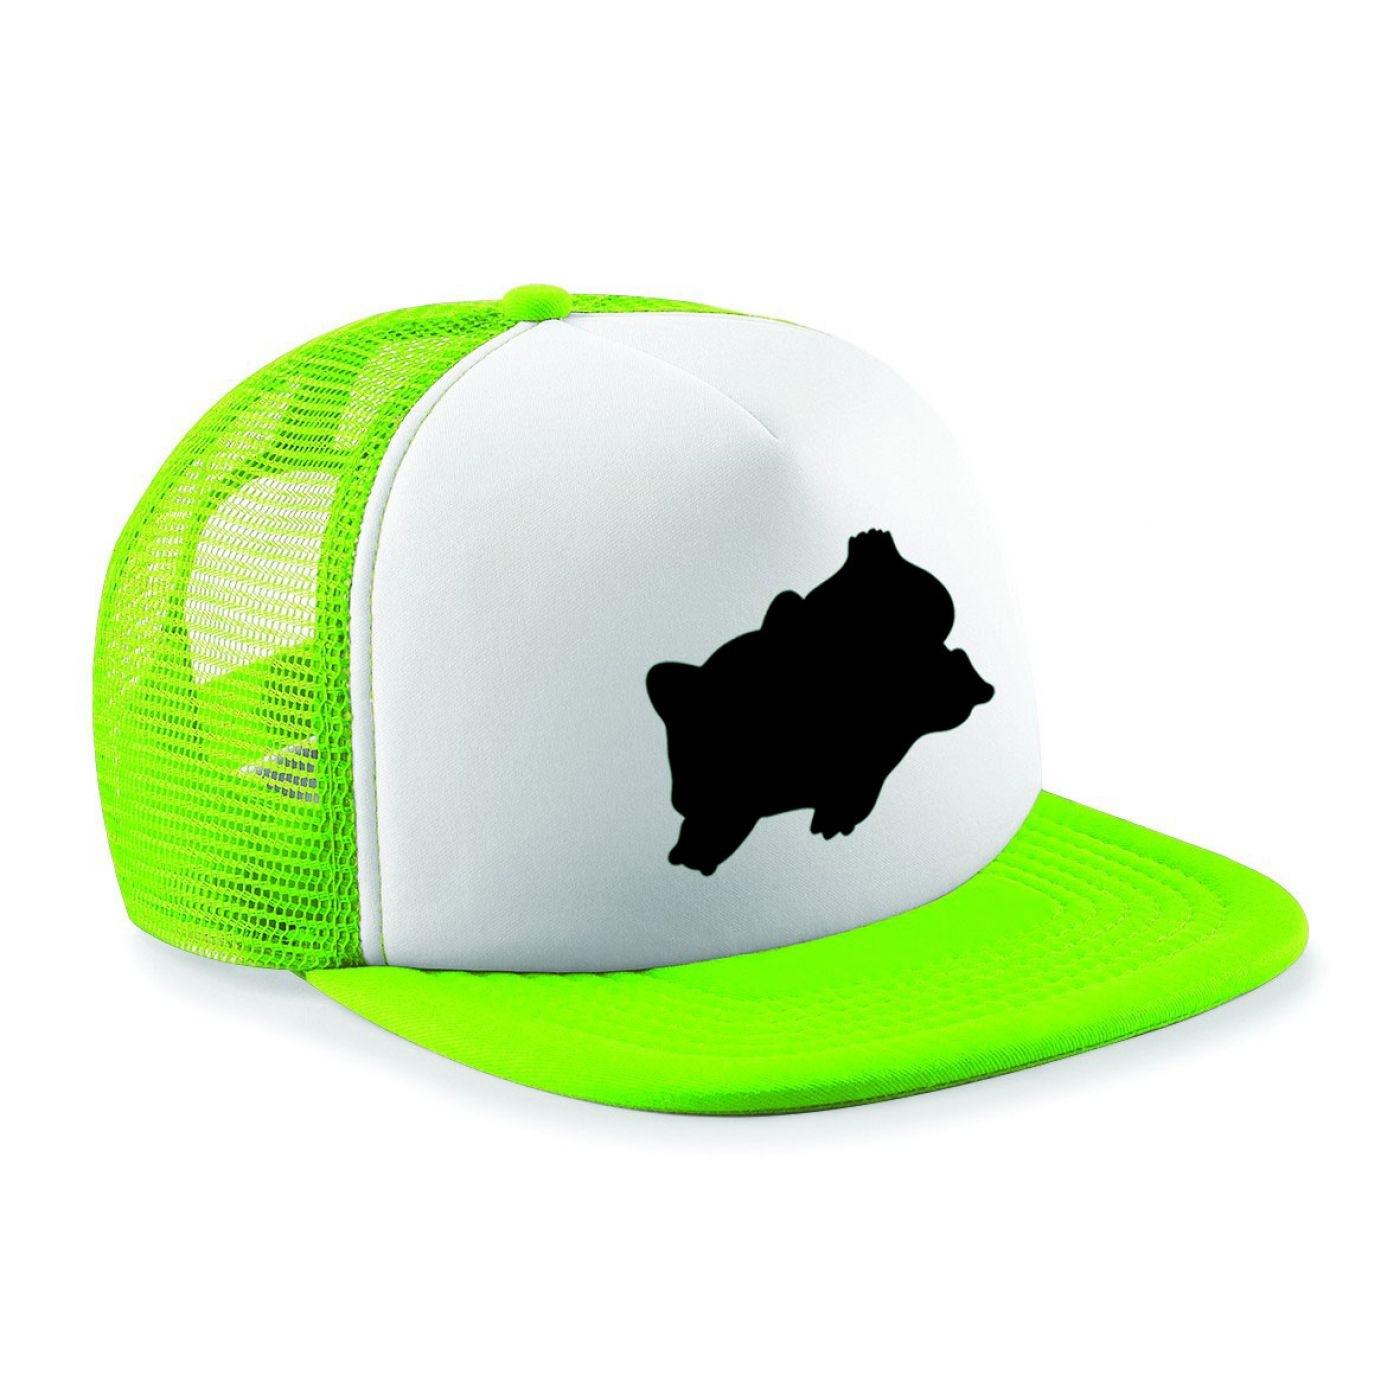 Bulbasaur Silhouette baseball cap